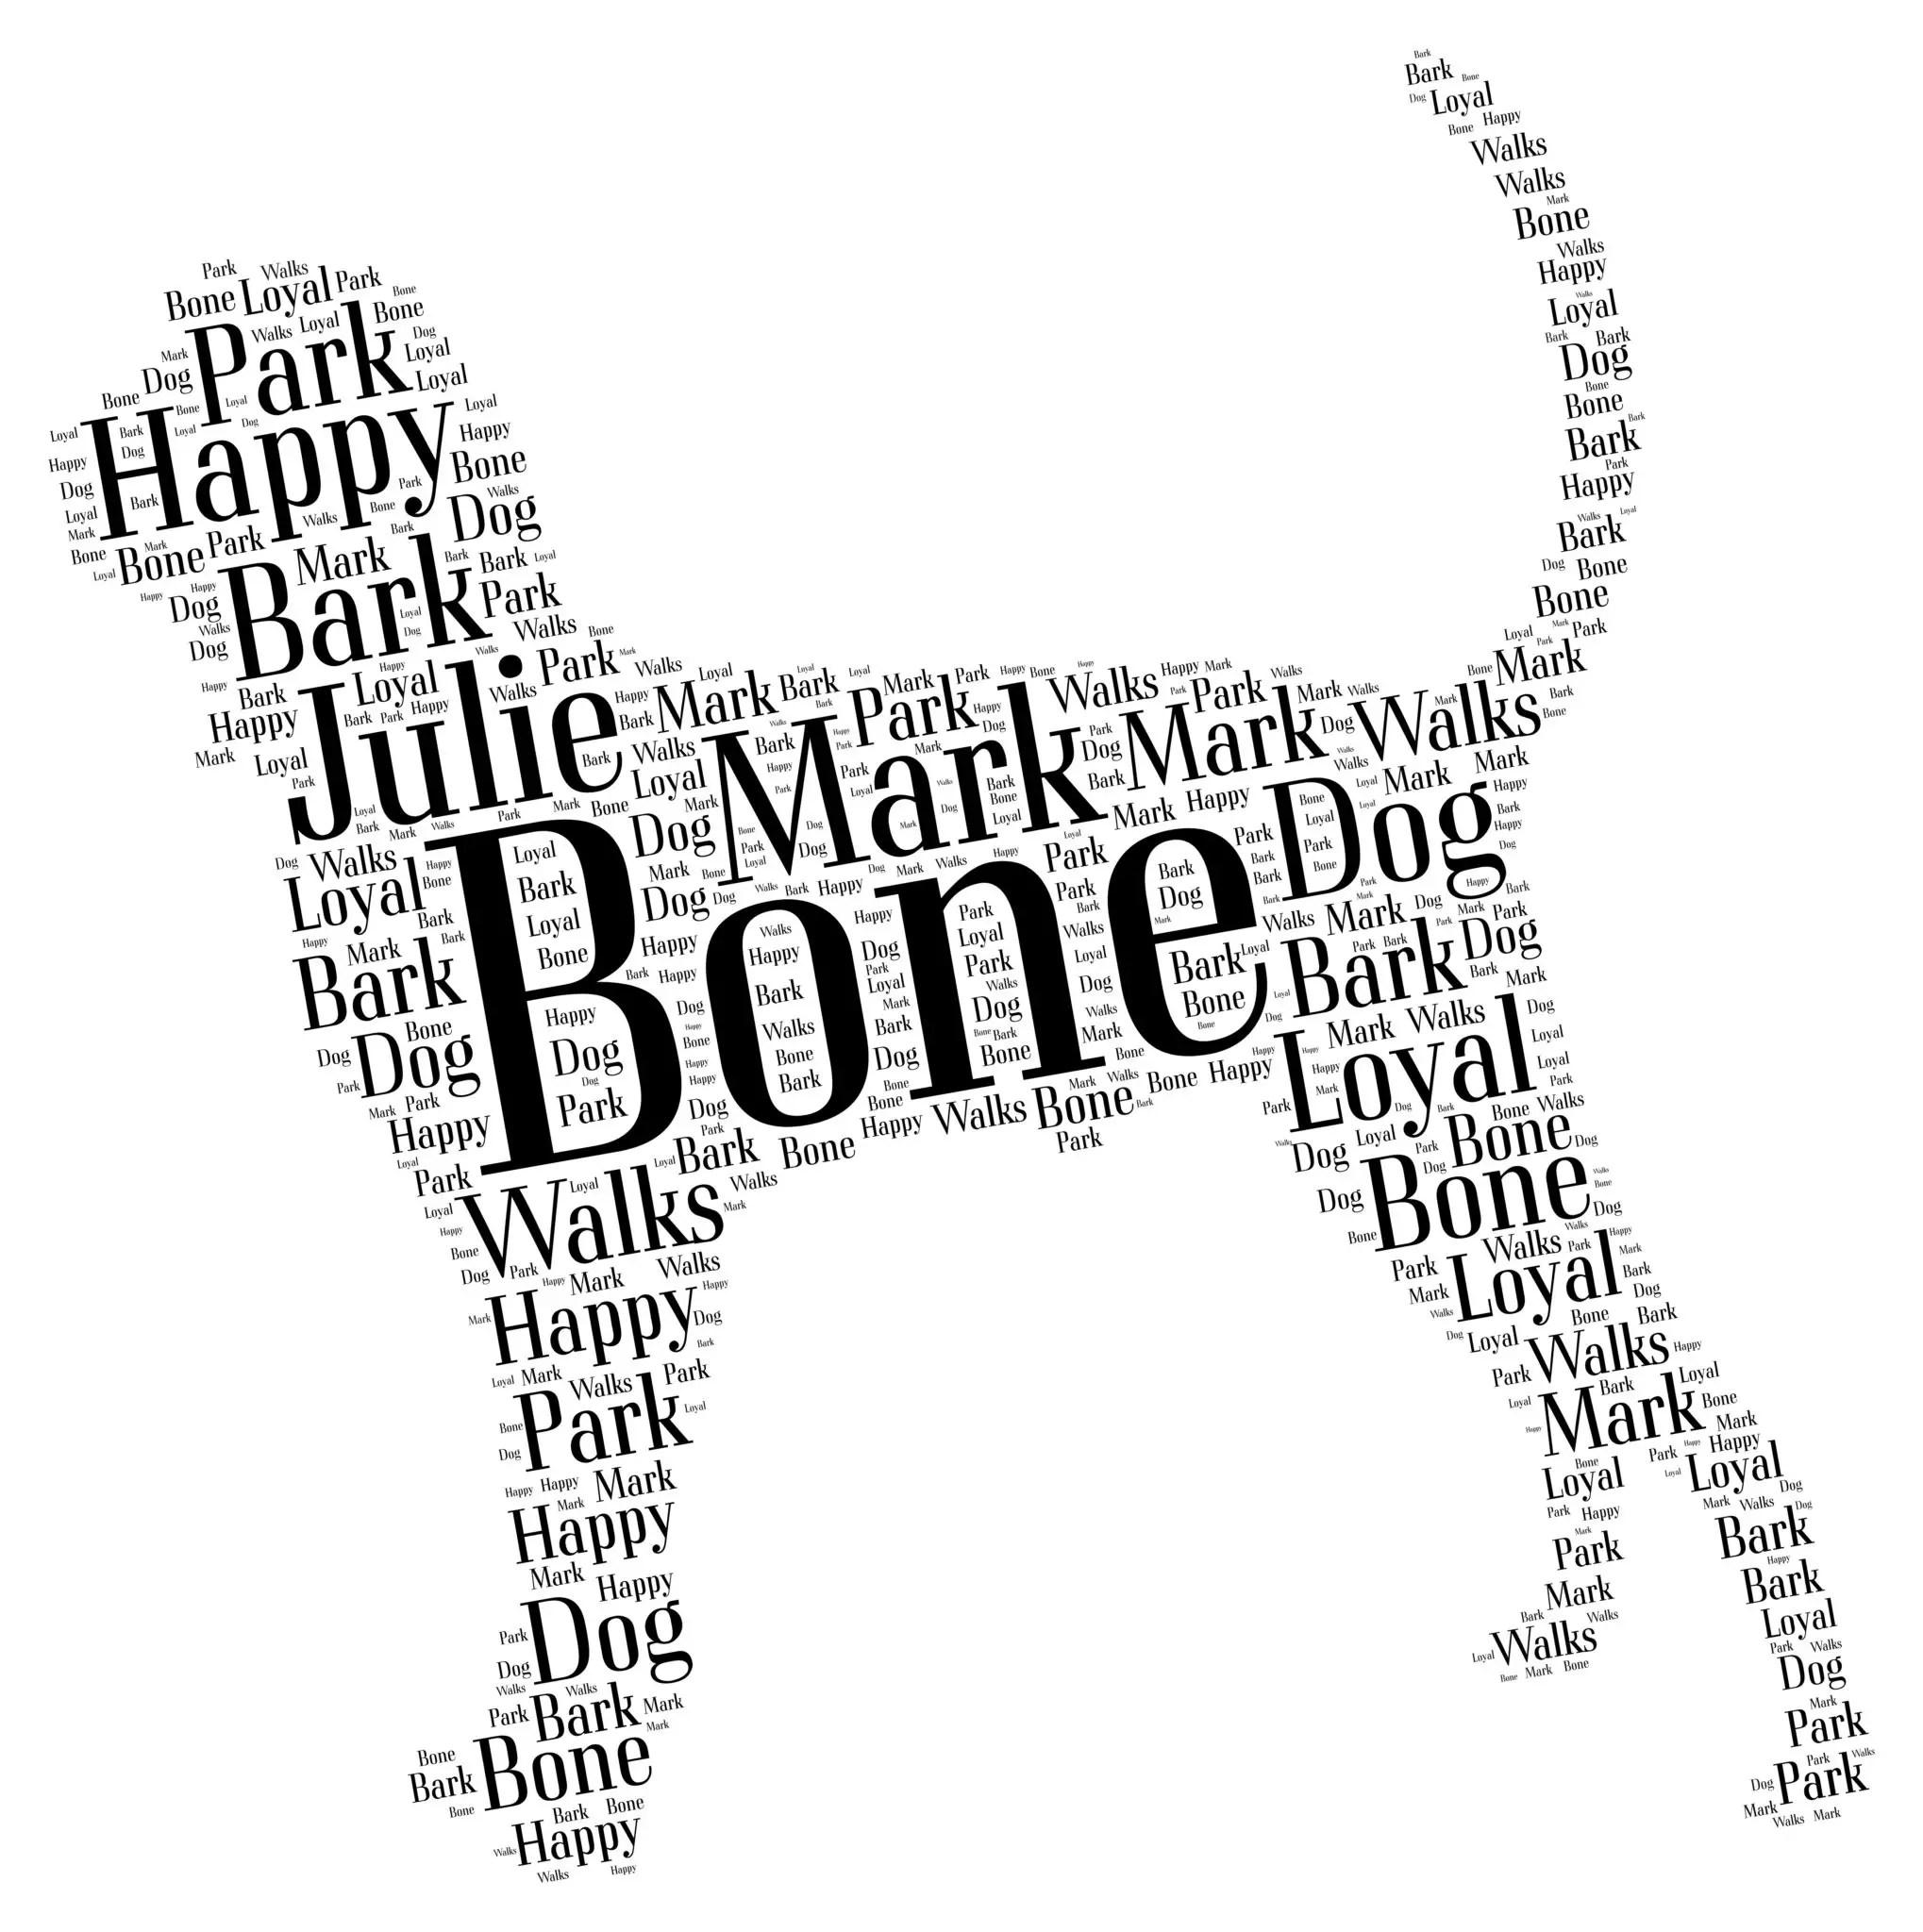 Black And Tan Coonhound Art Word Art Prints